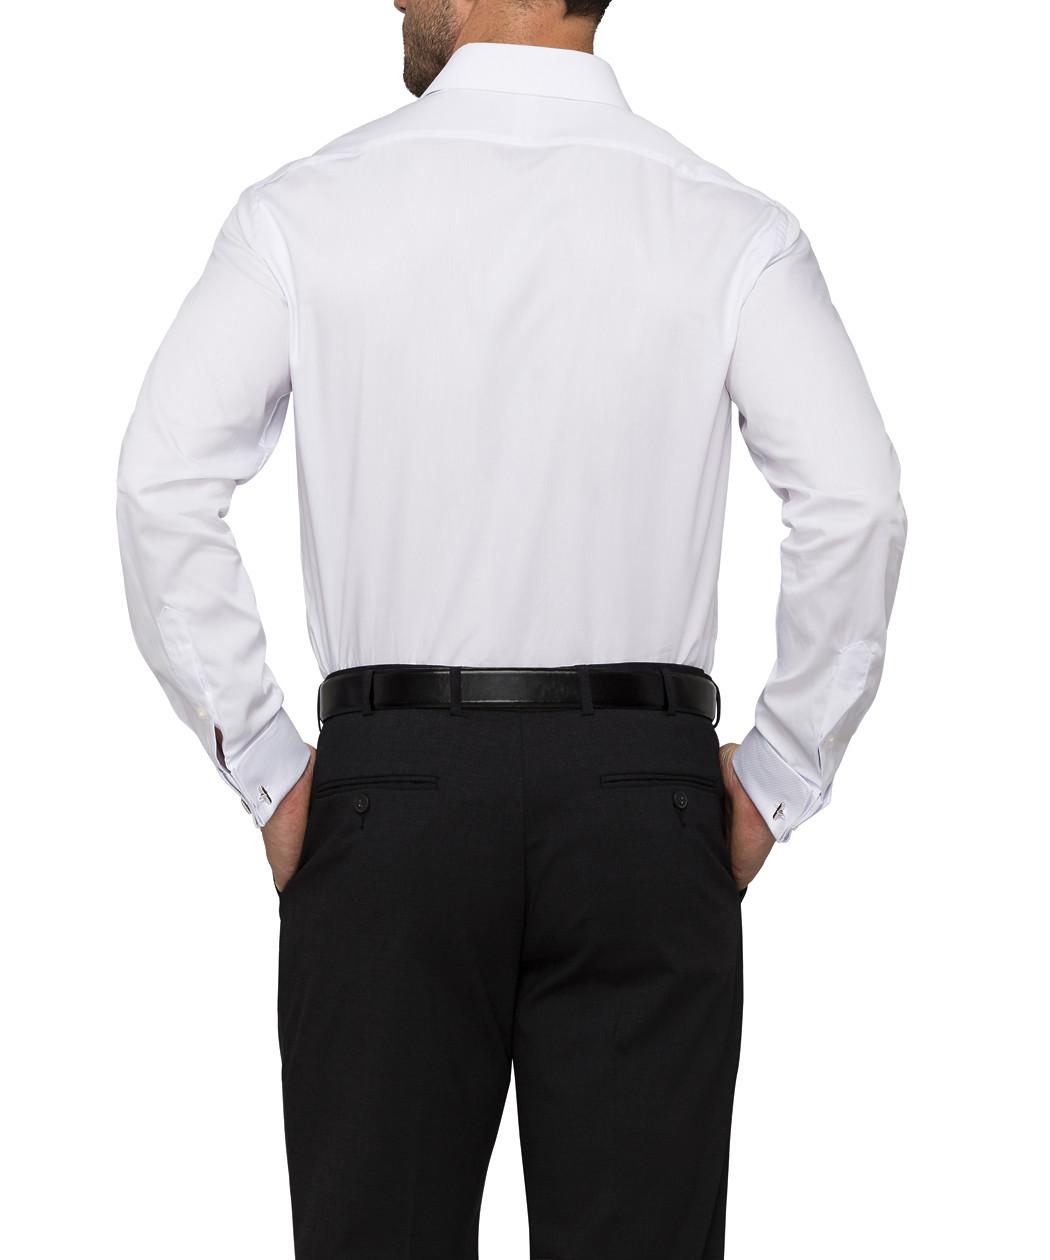 Van heusen cotton semi spread collar euro dinner shirt for Semi spread collar shirt